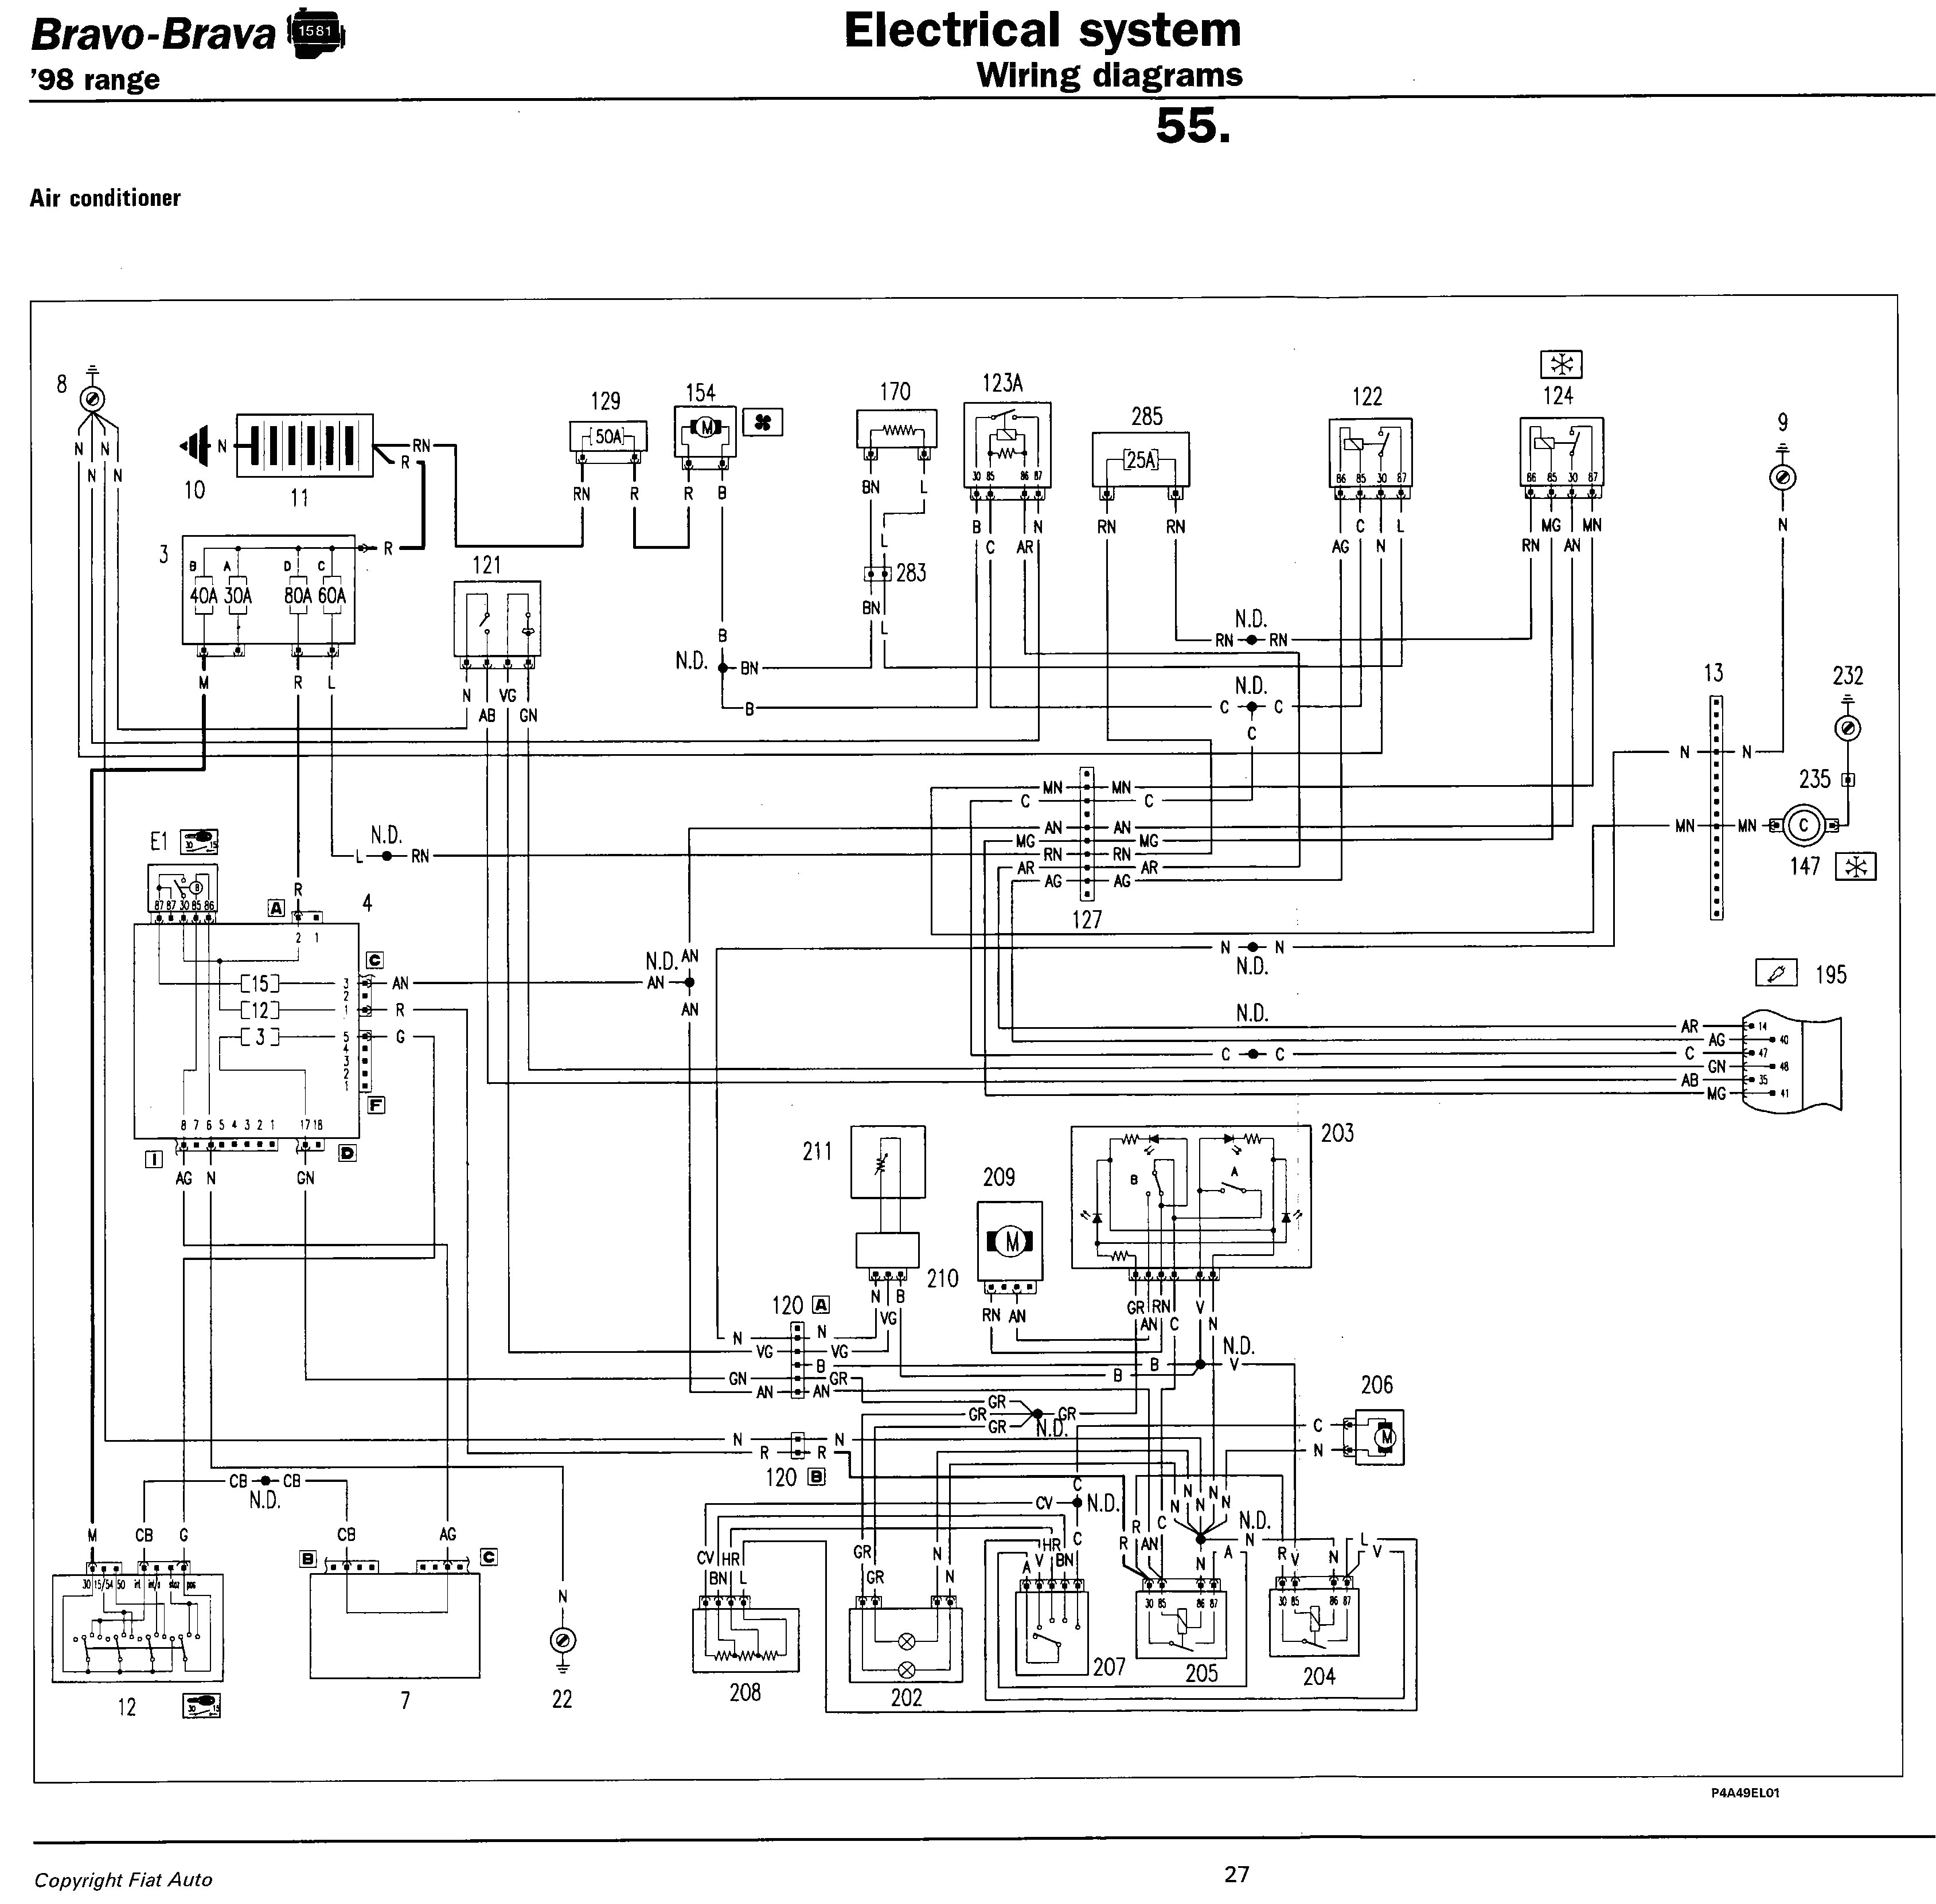 fiat ducato 2 8 jtd fiat circuit diagrams wiring diagrams fiat ducato 3 0 wiring diagram